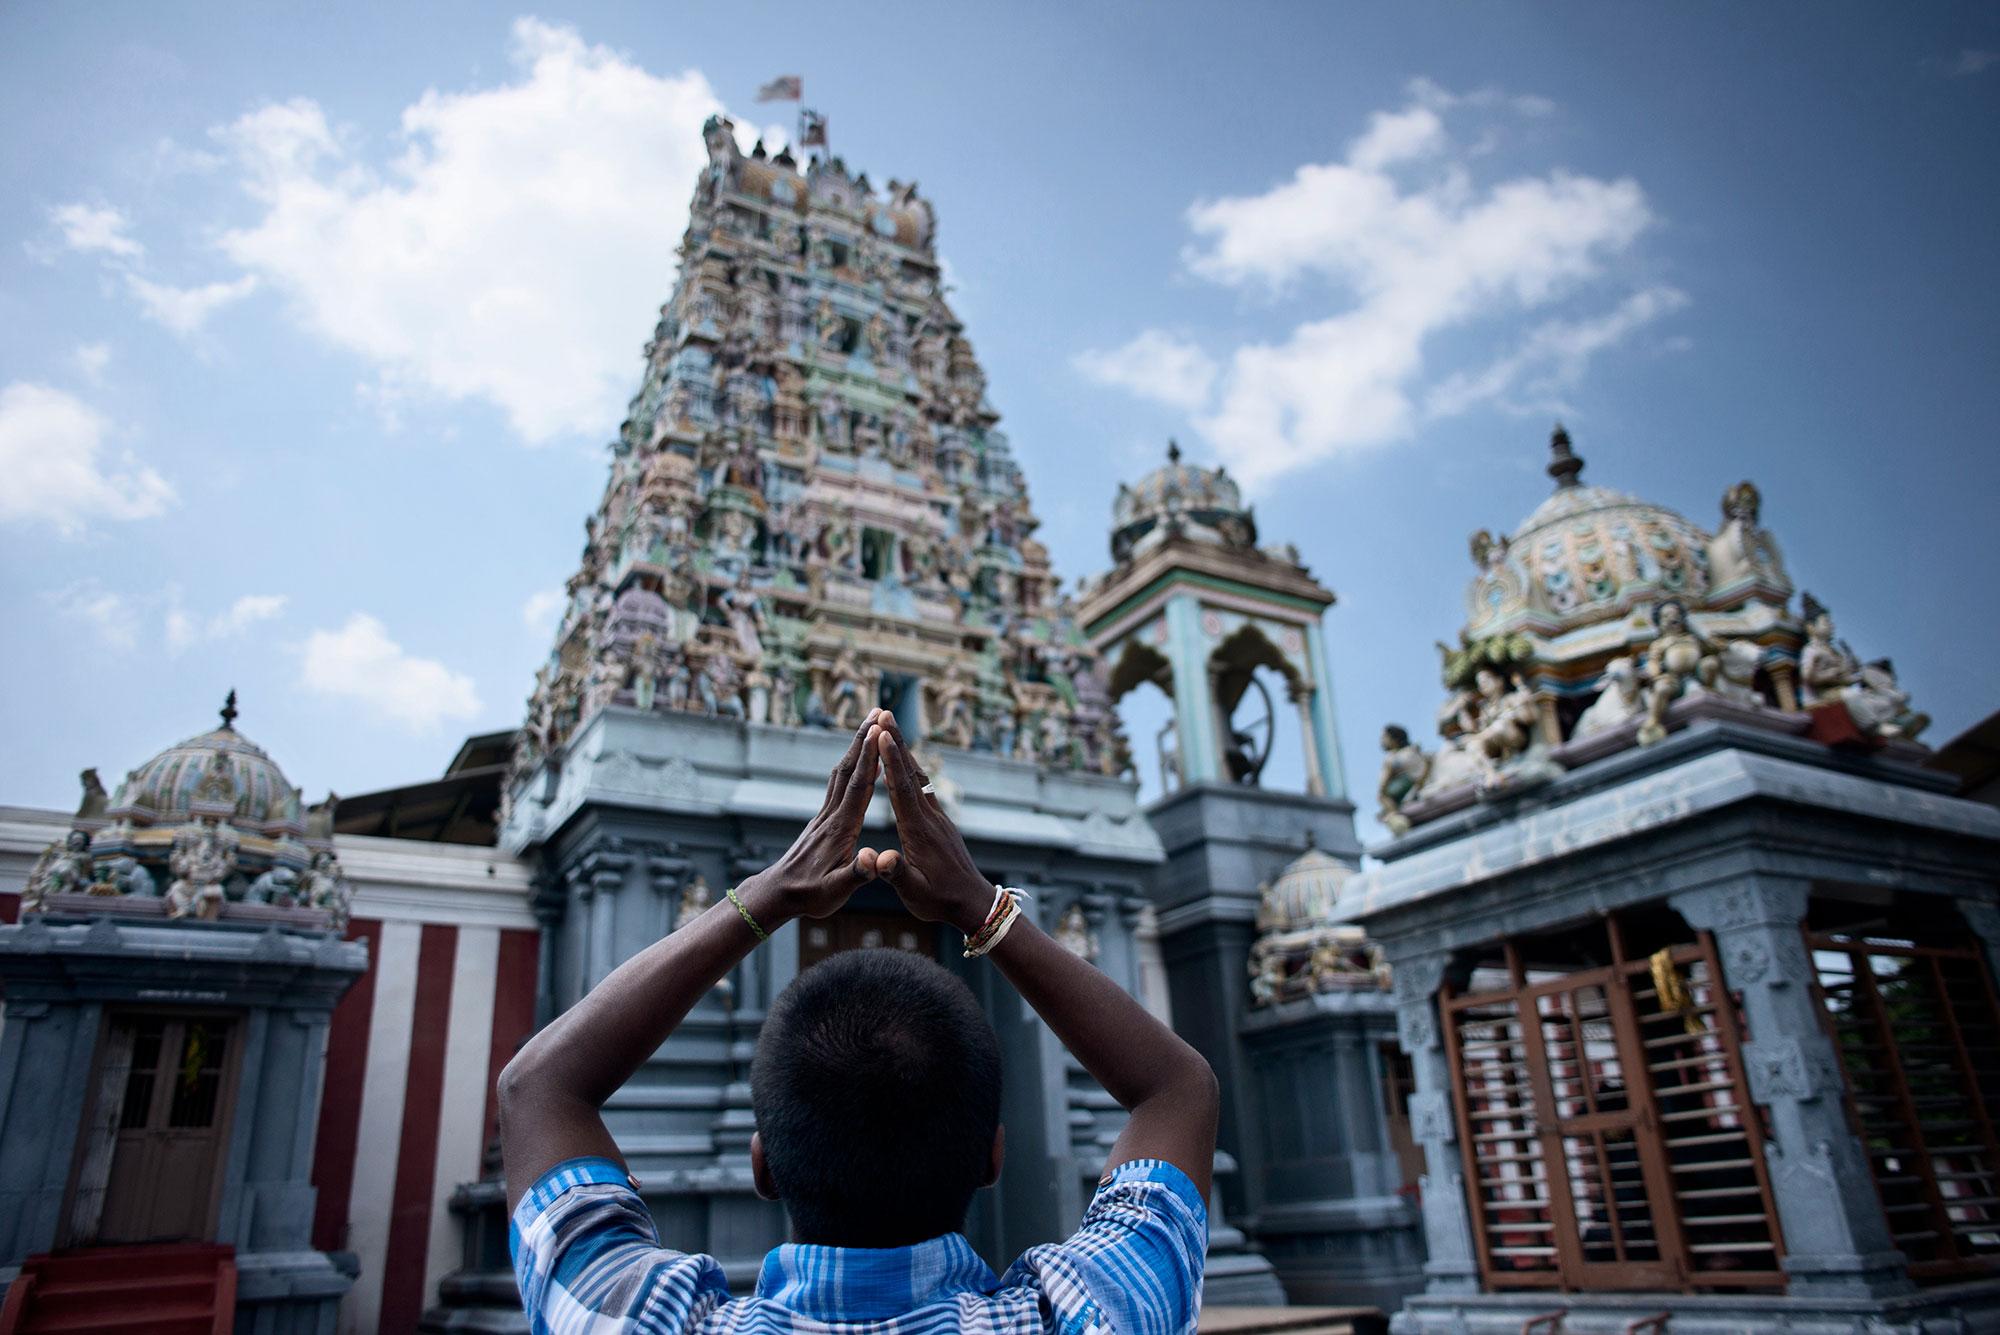 A Tamil devotee prays at a Hindu temple in Mannar district, in Sri Lanka's northwest. [Miguel Candela/Al Jazeera]